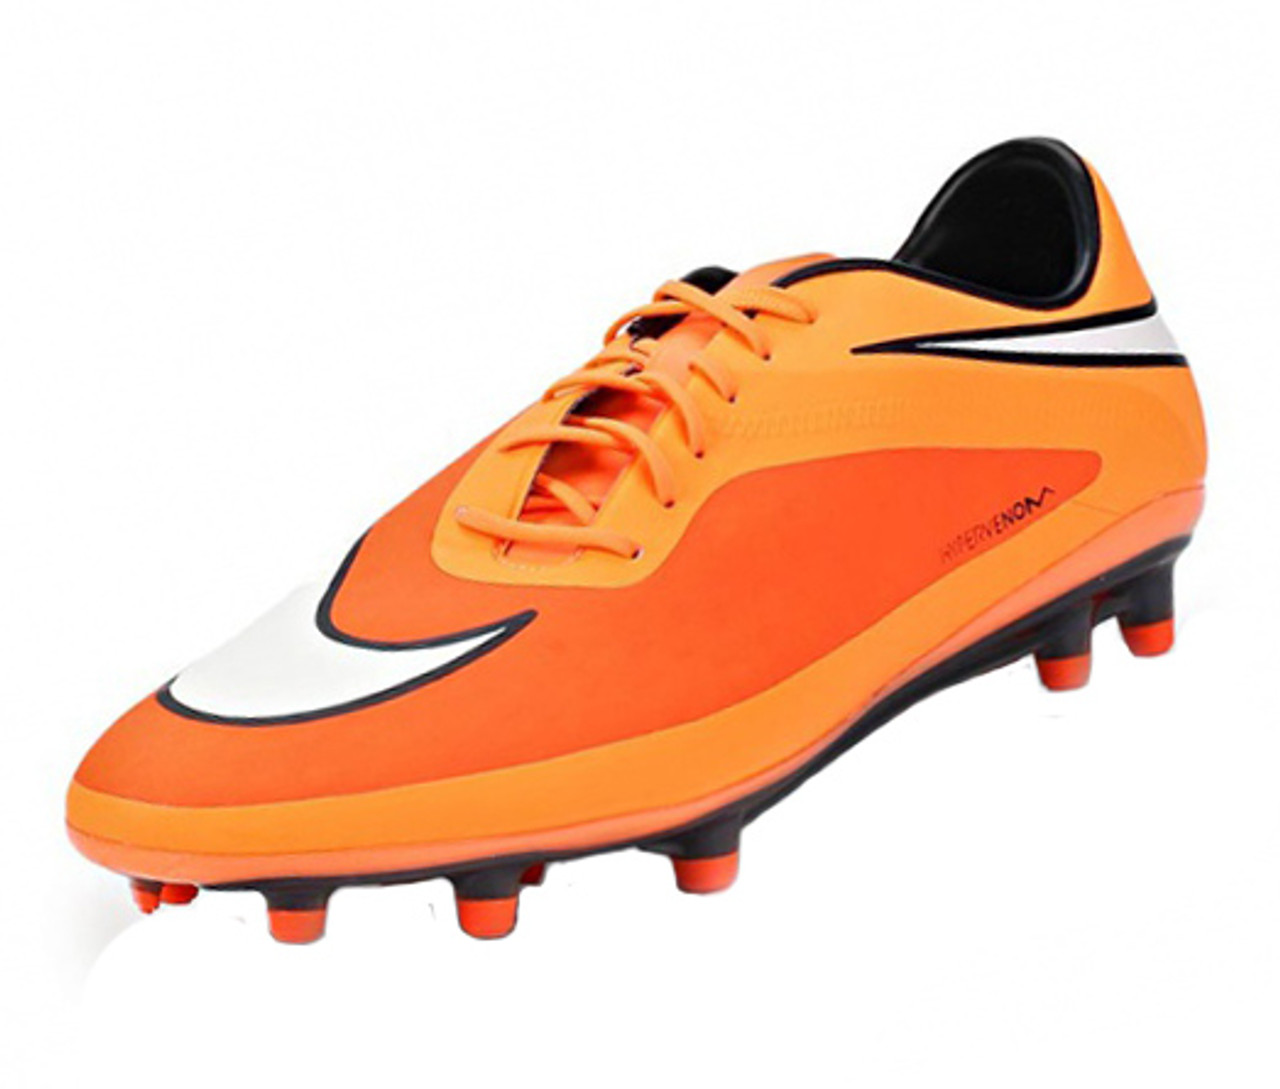 nouveau style 992a8 705d5 Nike Hypervenom Phatal FG - Hyper Crimson (11319) SD